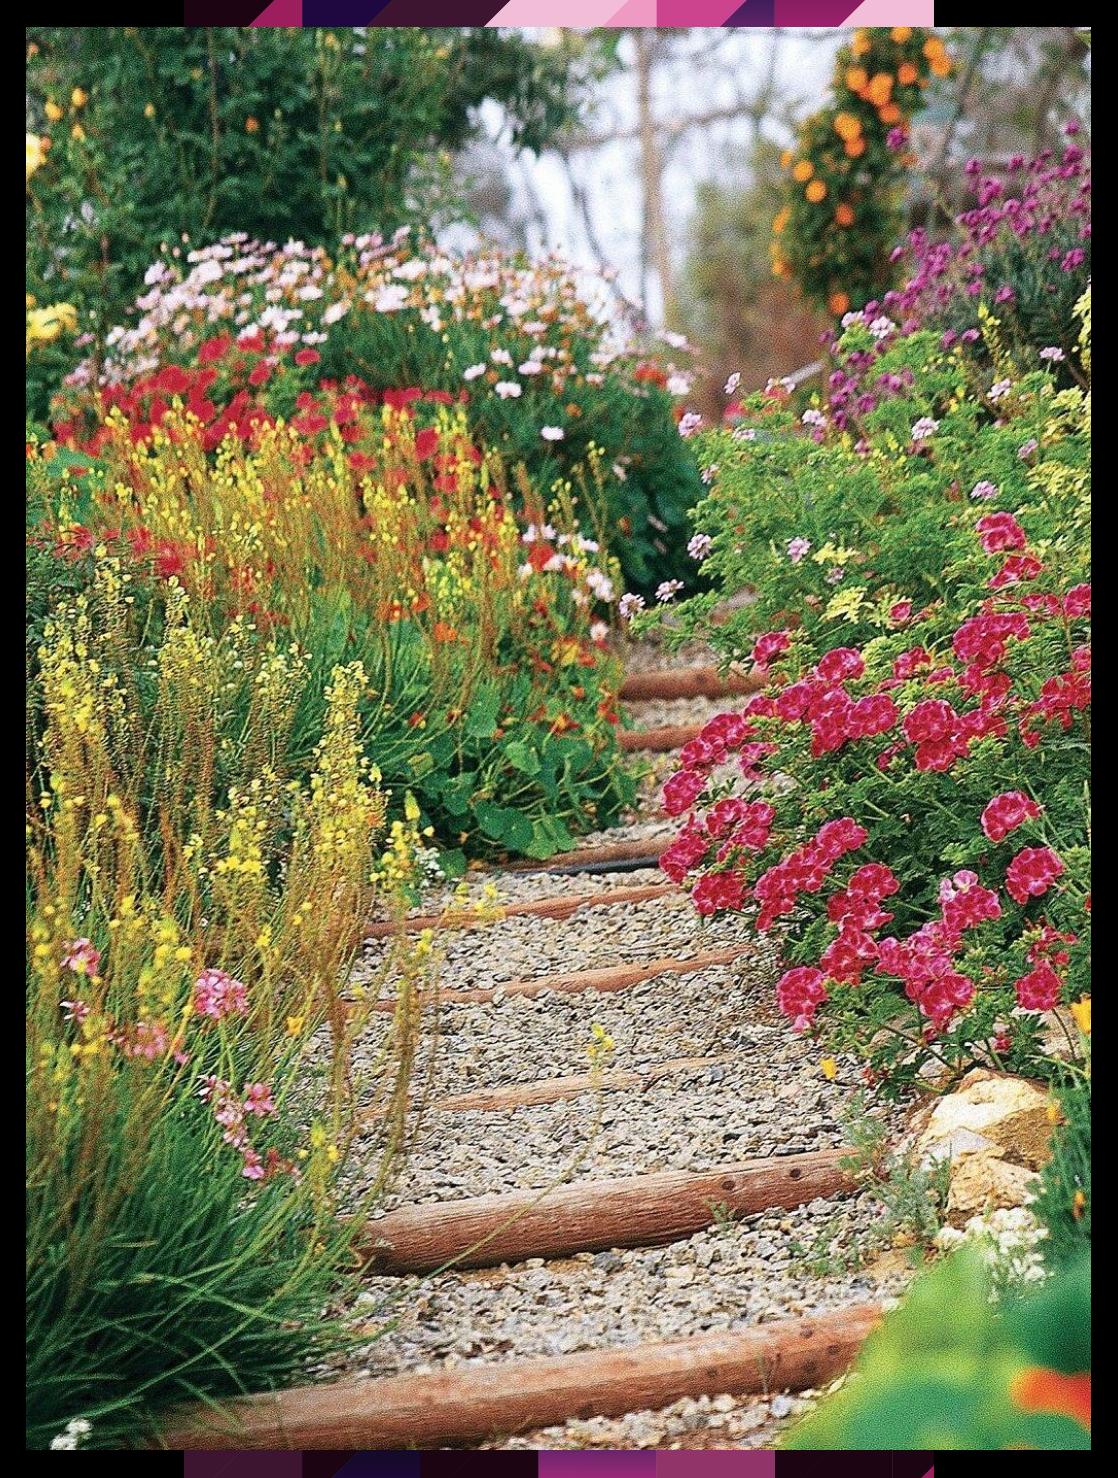 6 Steps to a No-Work Cottage Garden #Cottage #garden #NoWork #steps